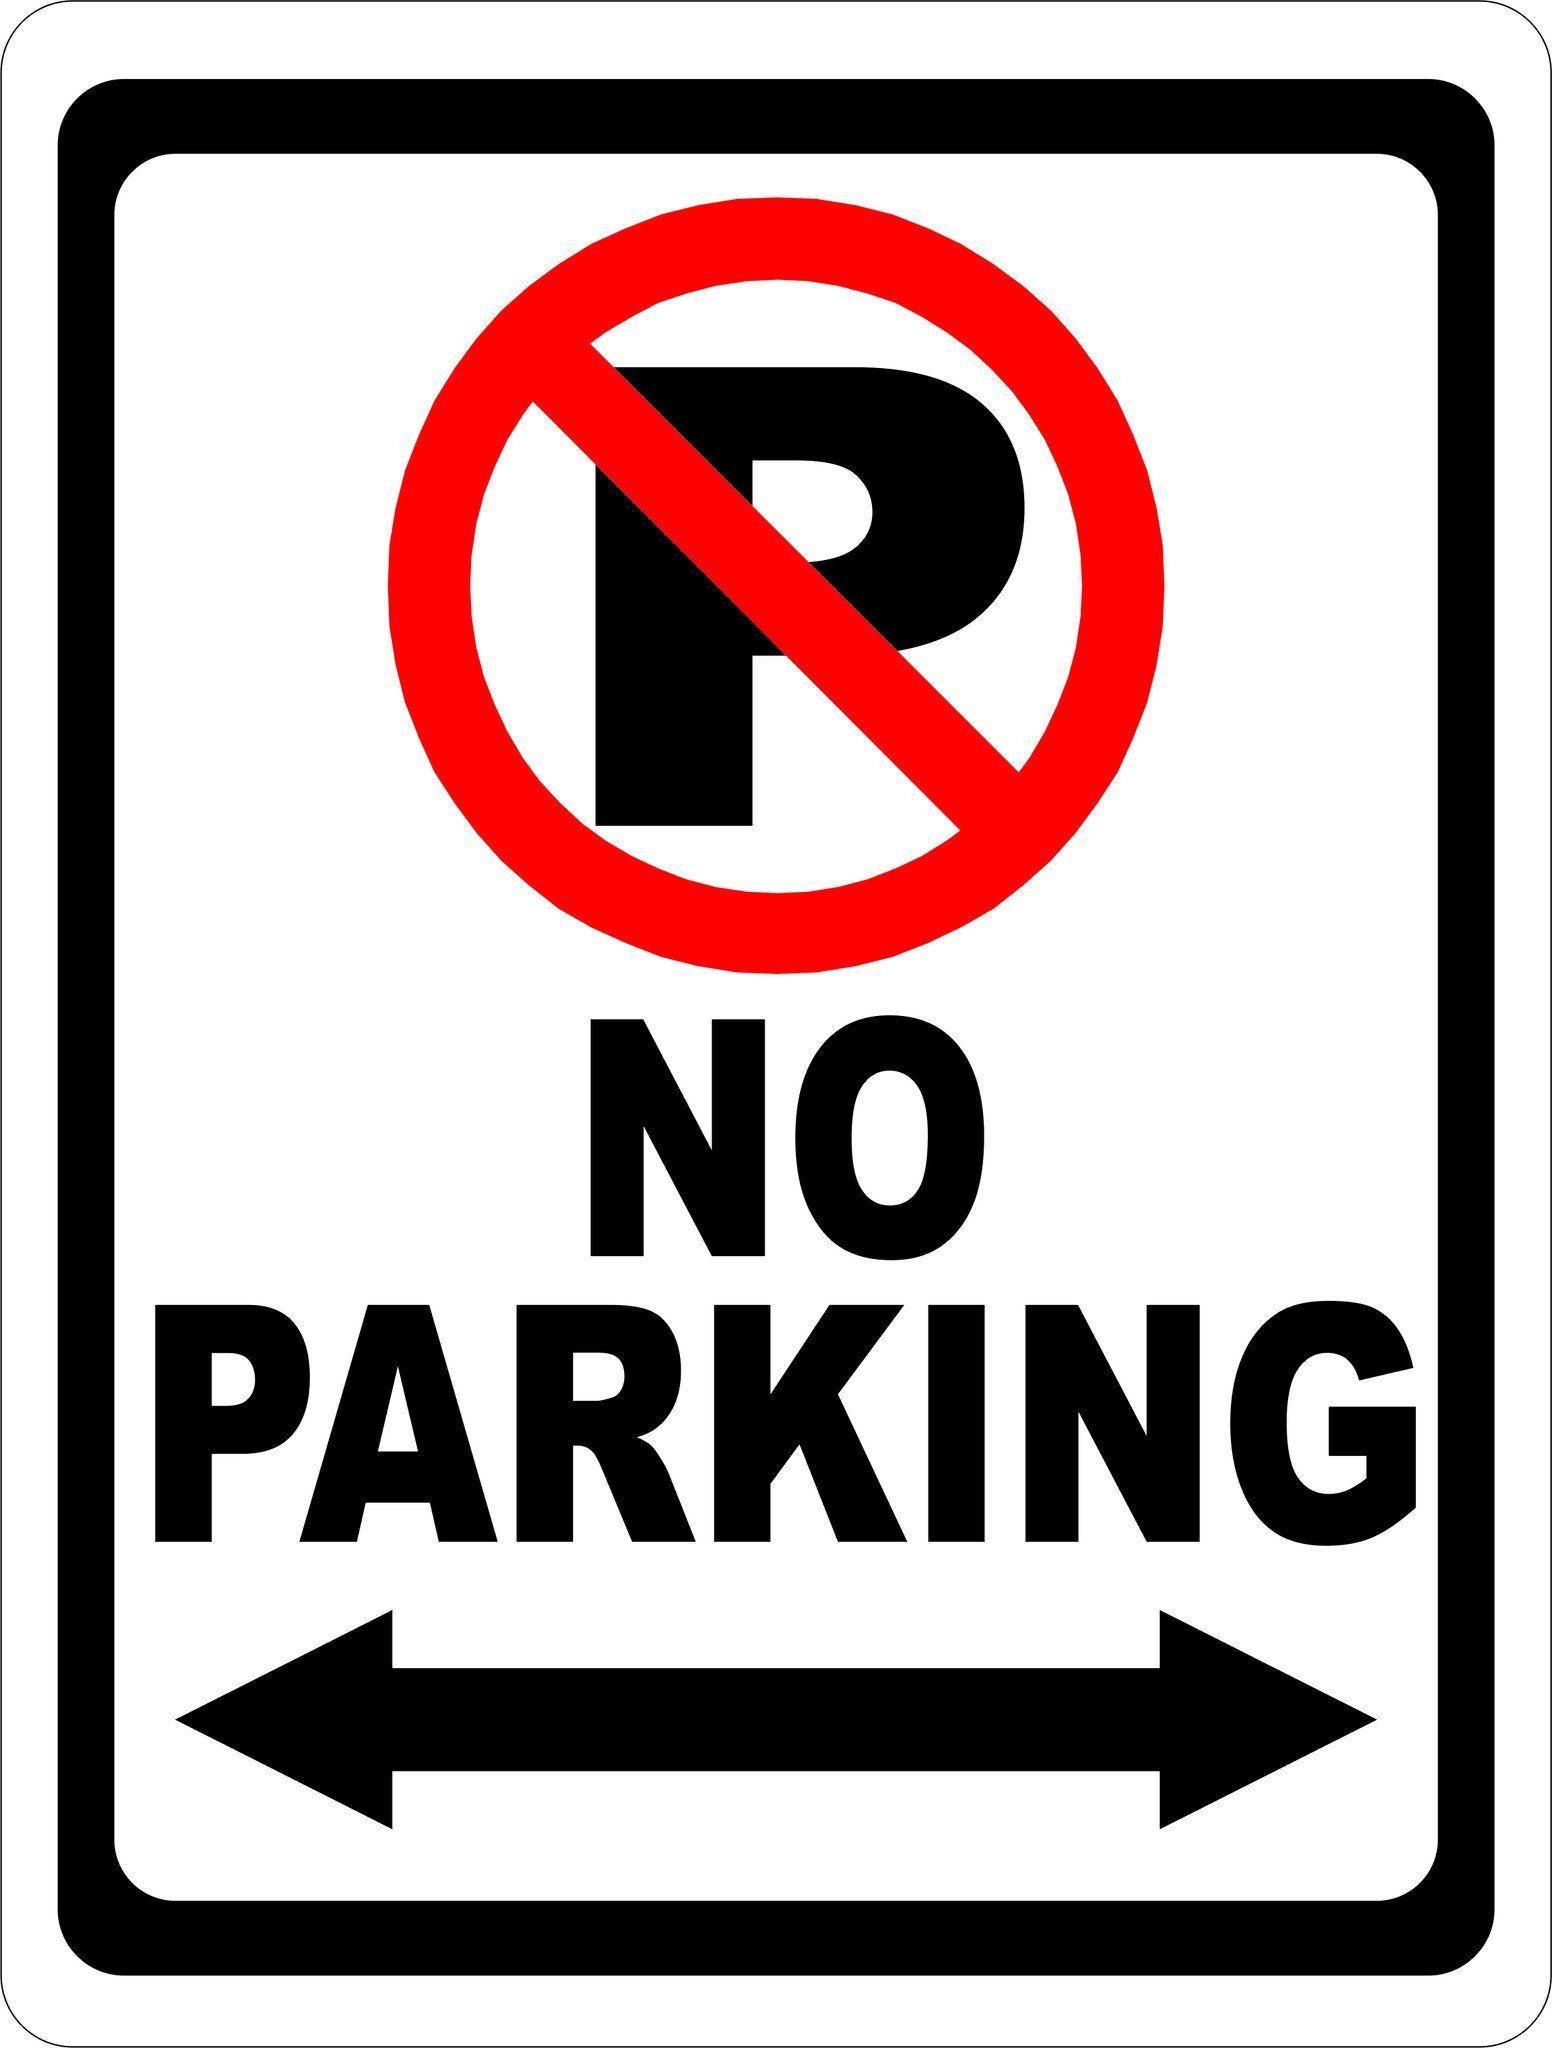 No Parking Sign With Symbol And Arrow Parking Signs Office Door Signs Door Signs